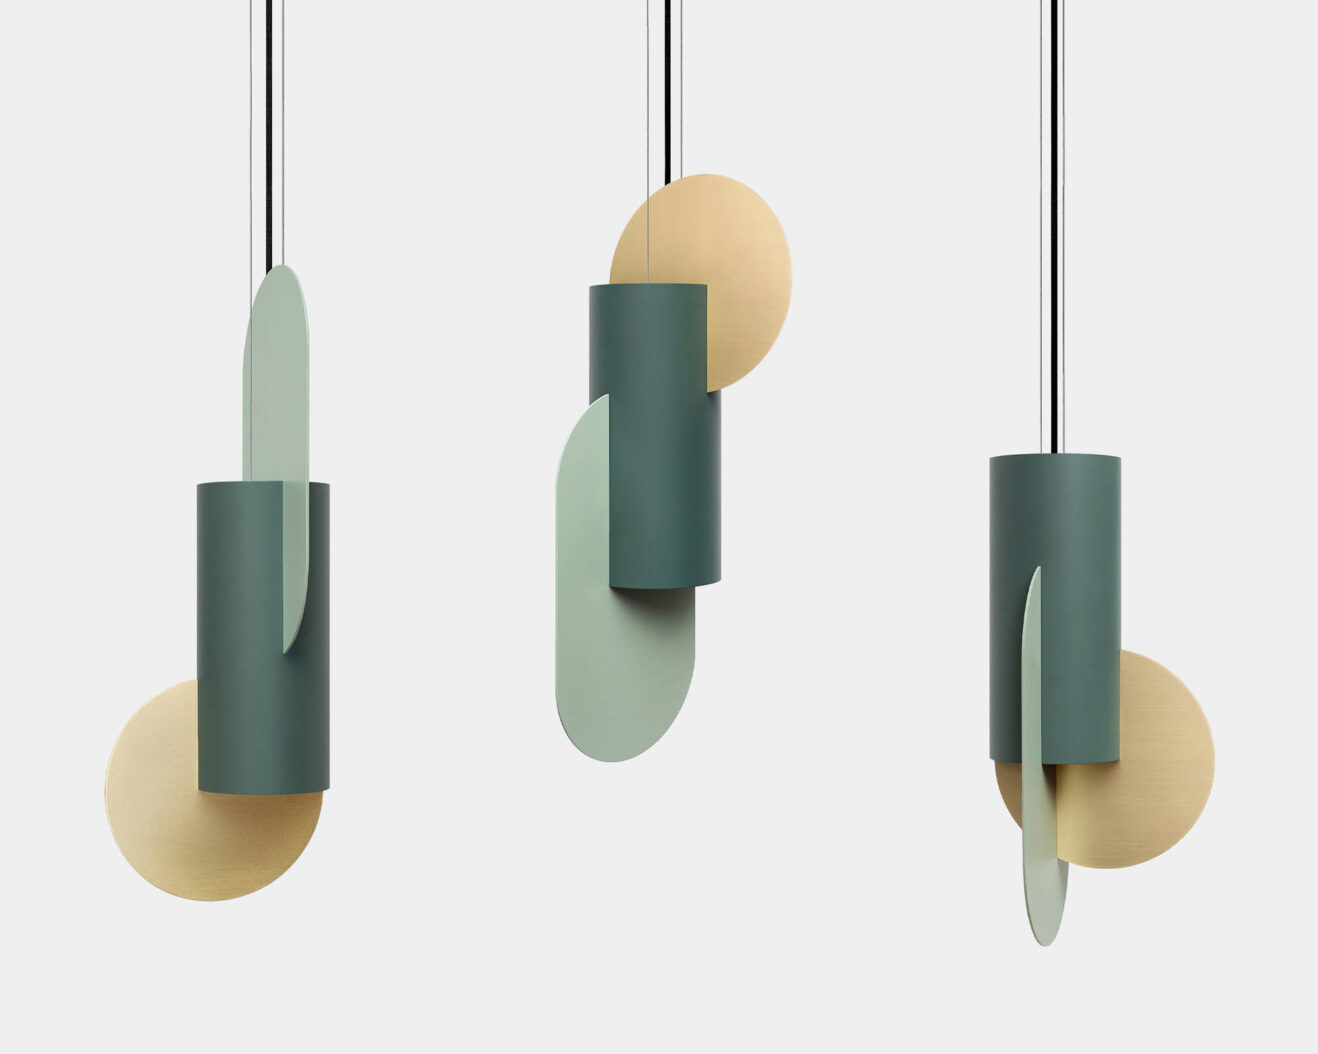 Noom-Suprematic-Lamp-CS5-4